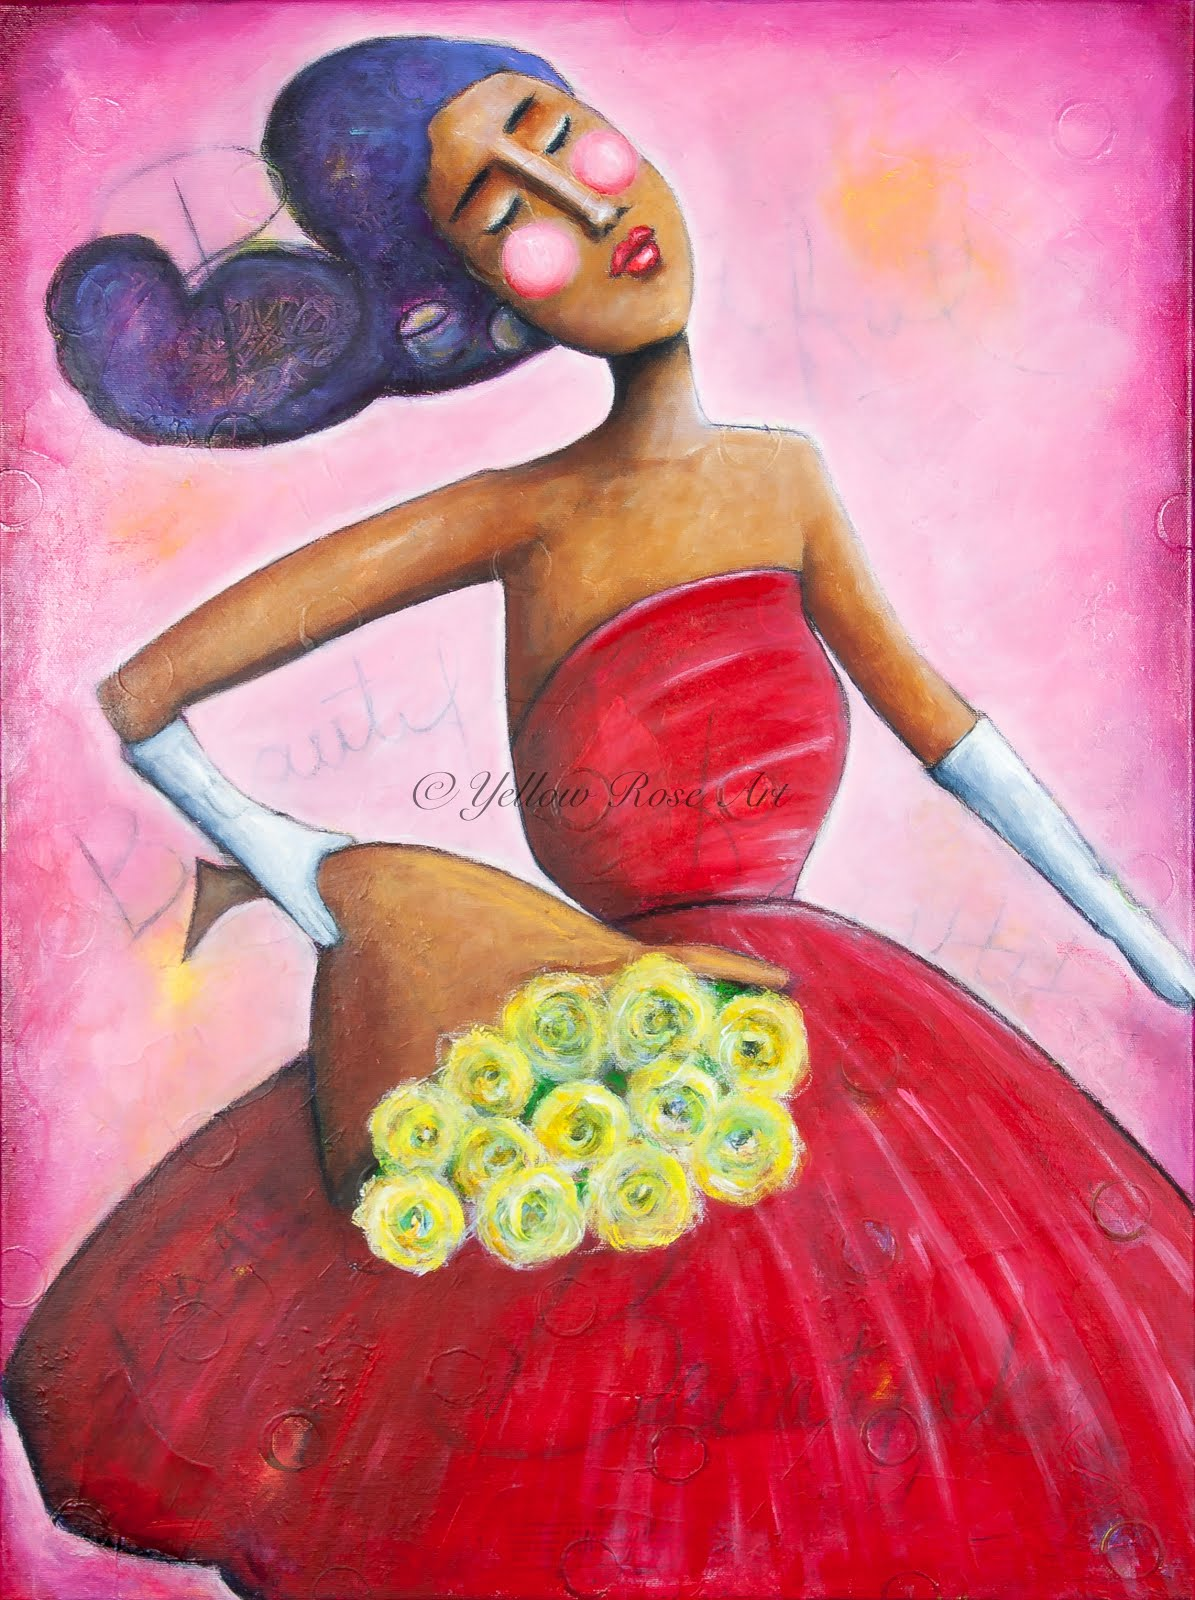 I hope that my art brings you joy!